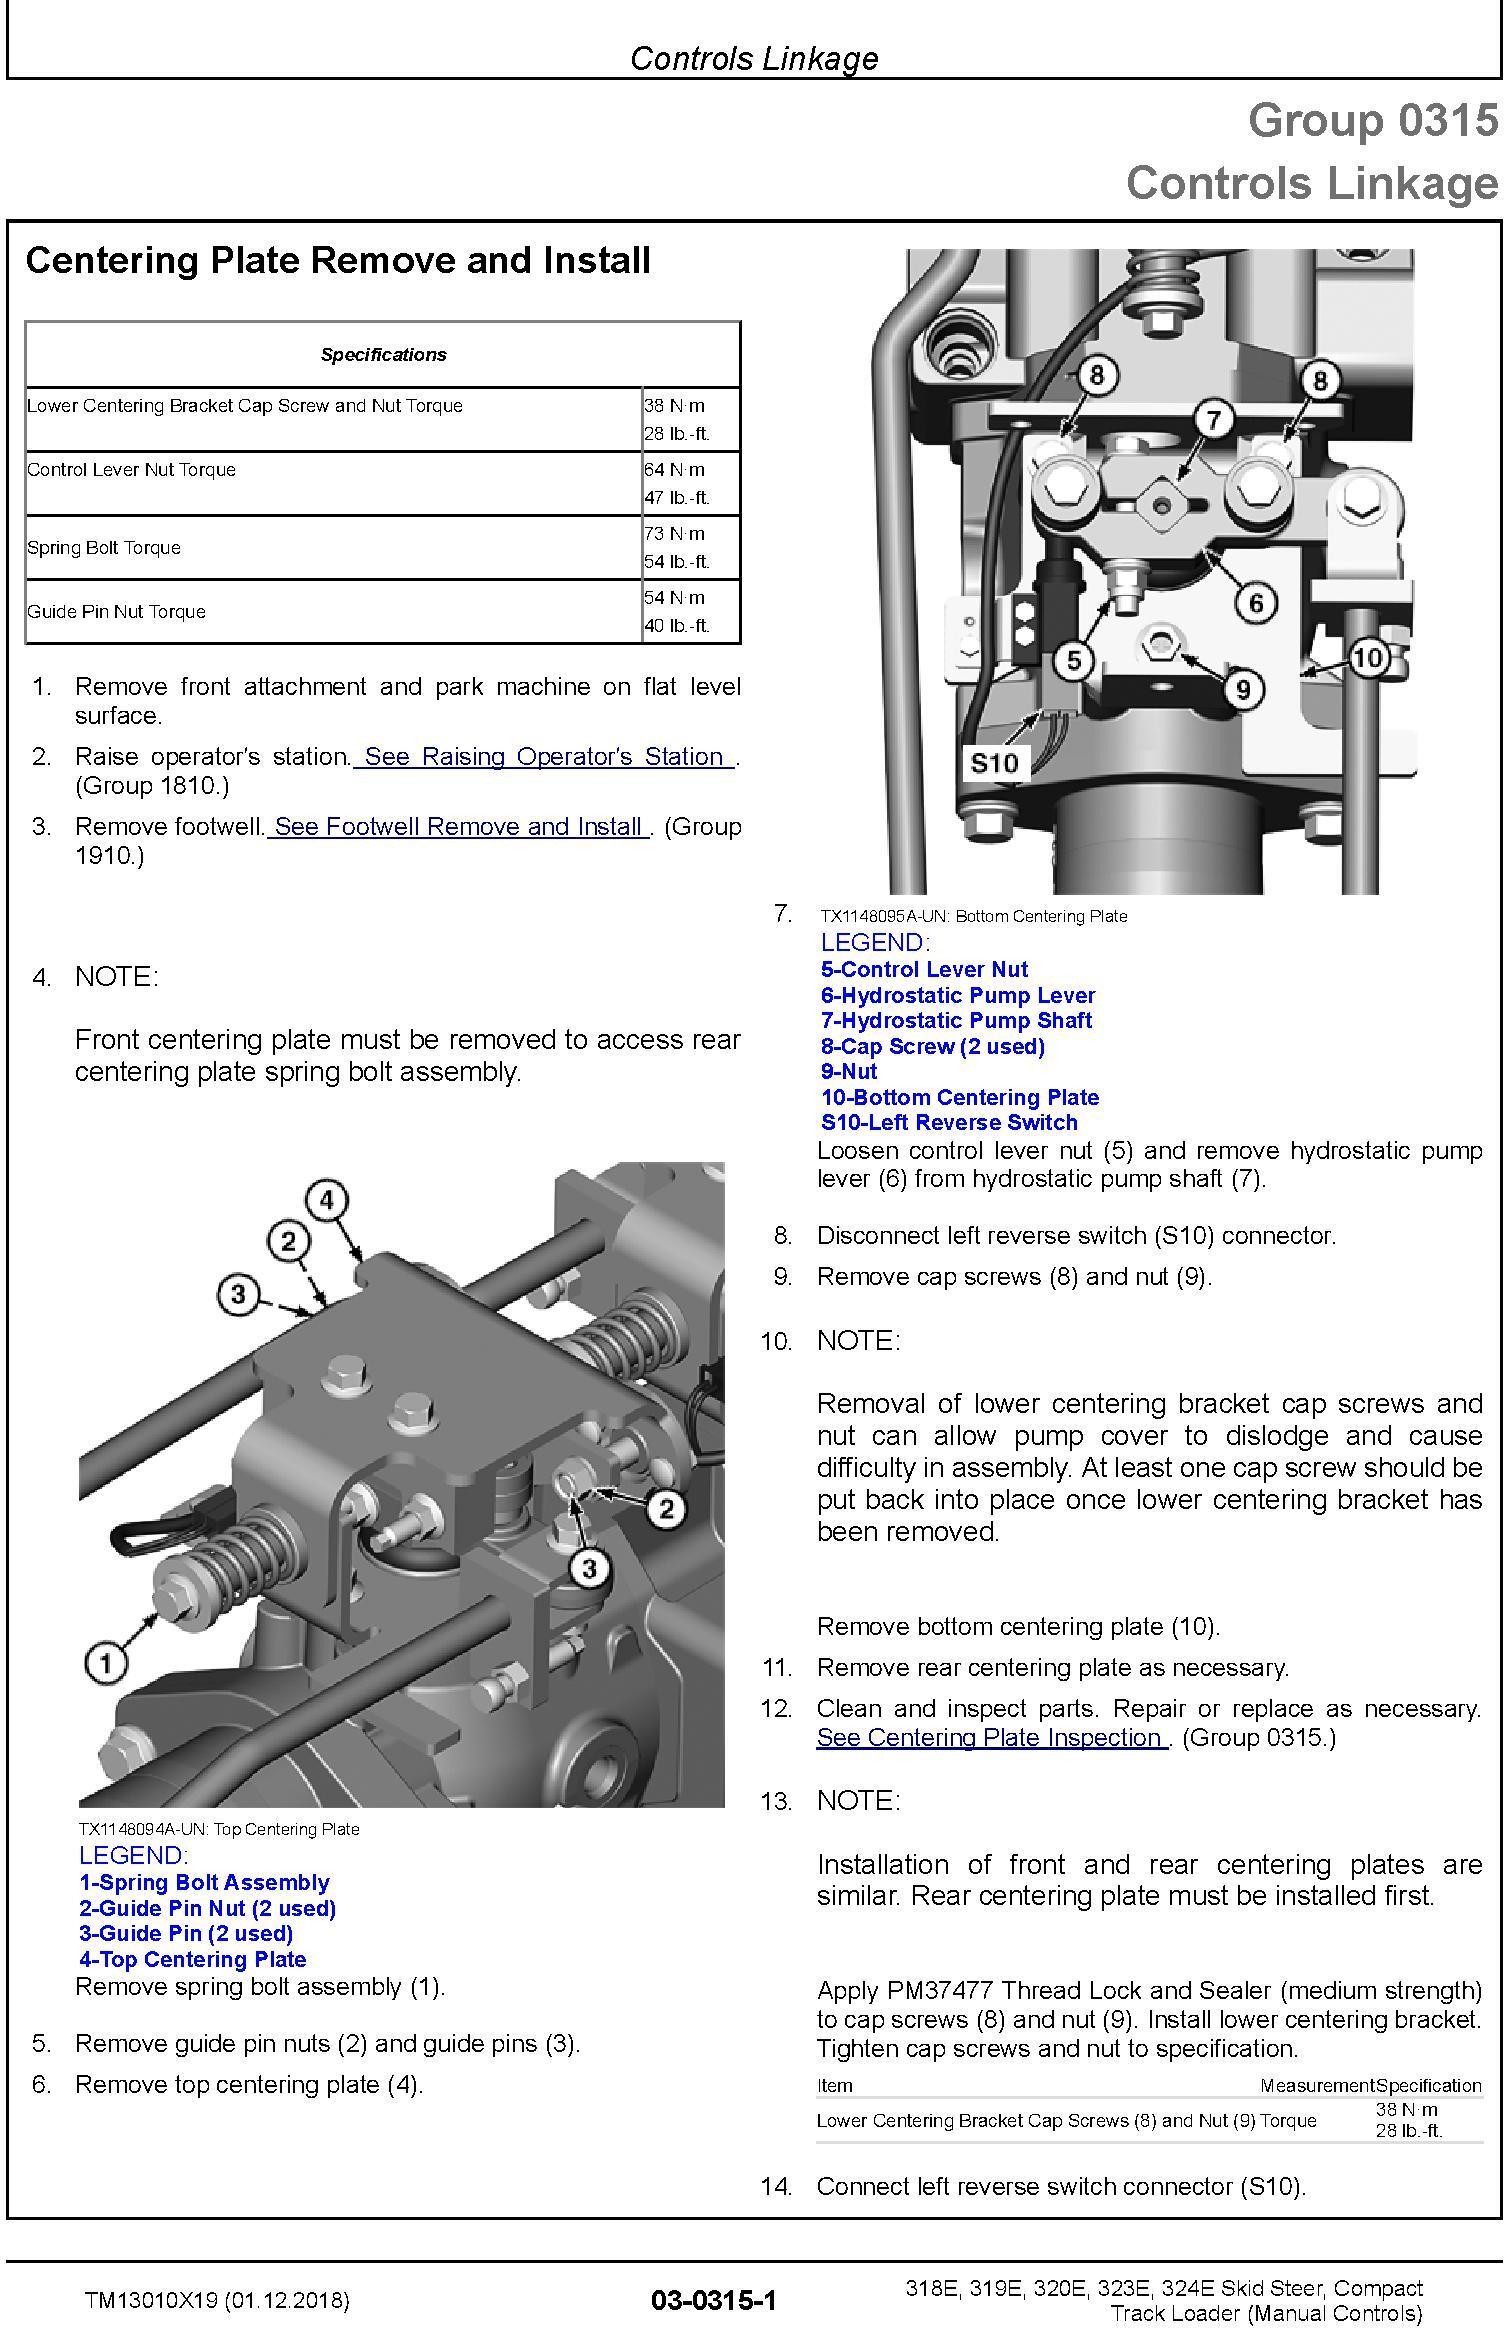 TM13010X19 - John Deere 318E, 319E, 320E, 323E, 324E Compact Loader w.Manual Controls Repair Manual - 2